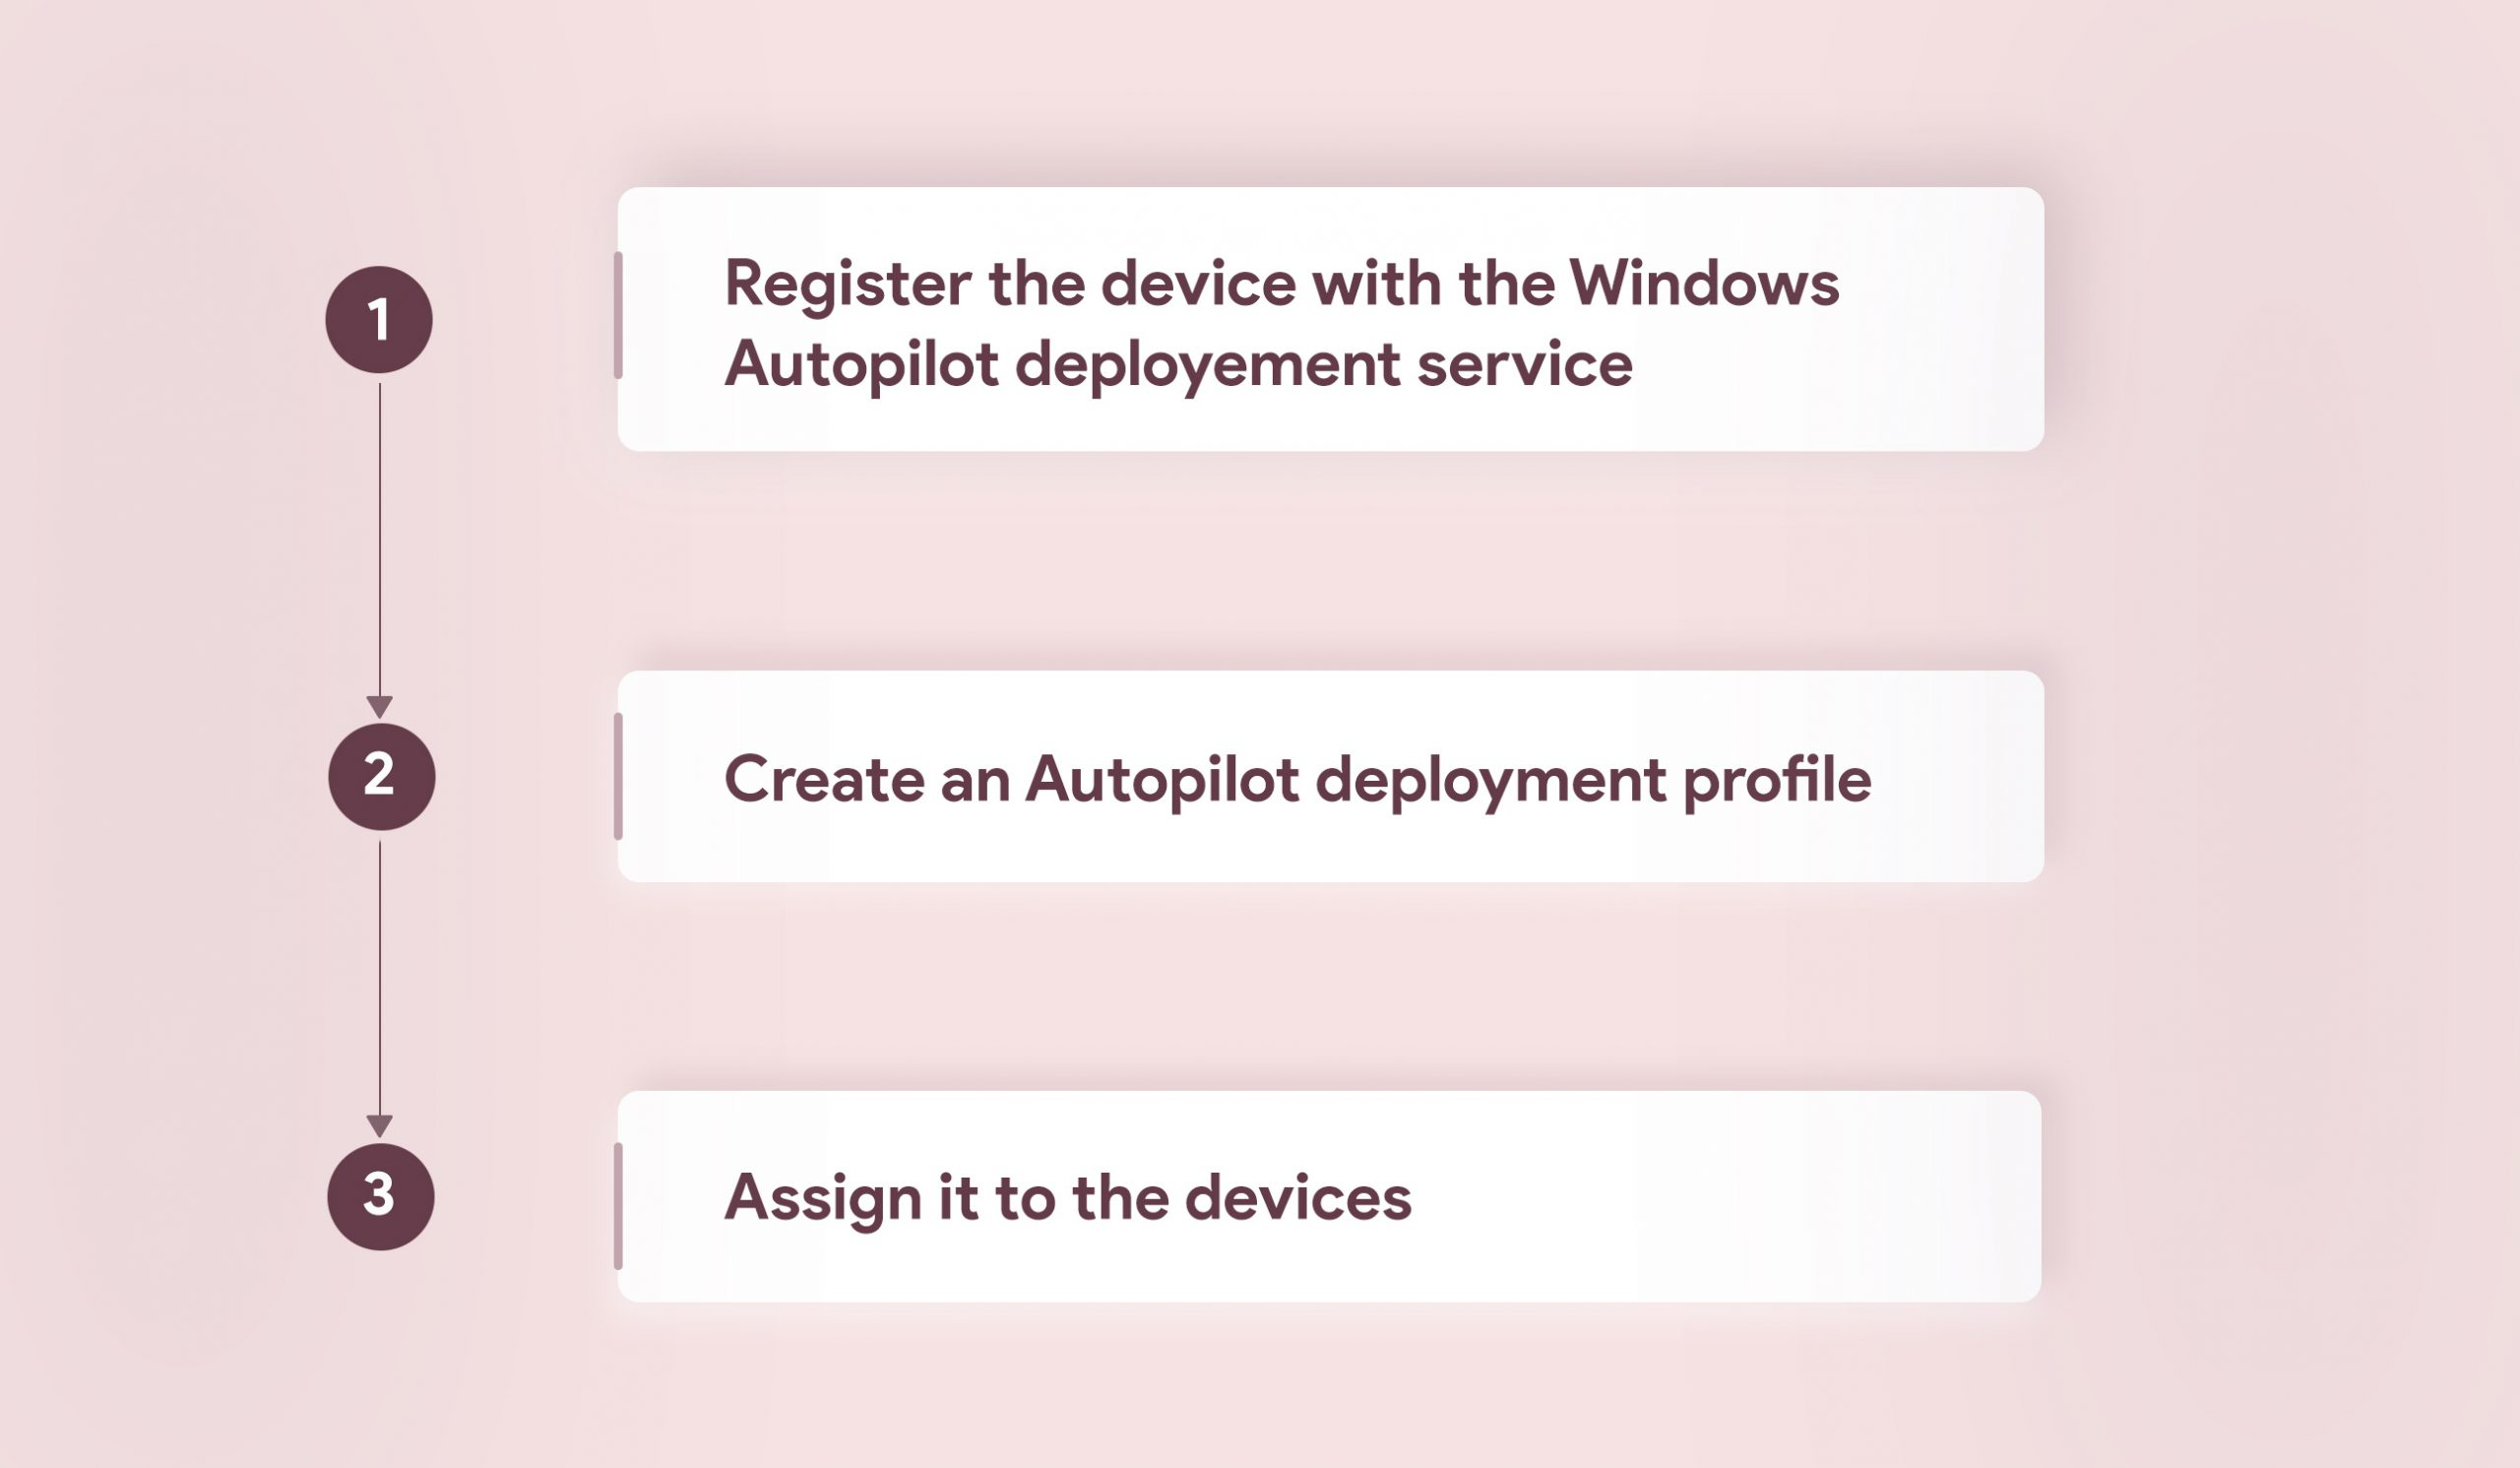 Deploying Windows 10 devices via Windows Autopilot